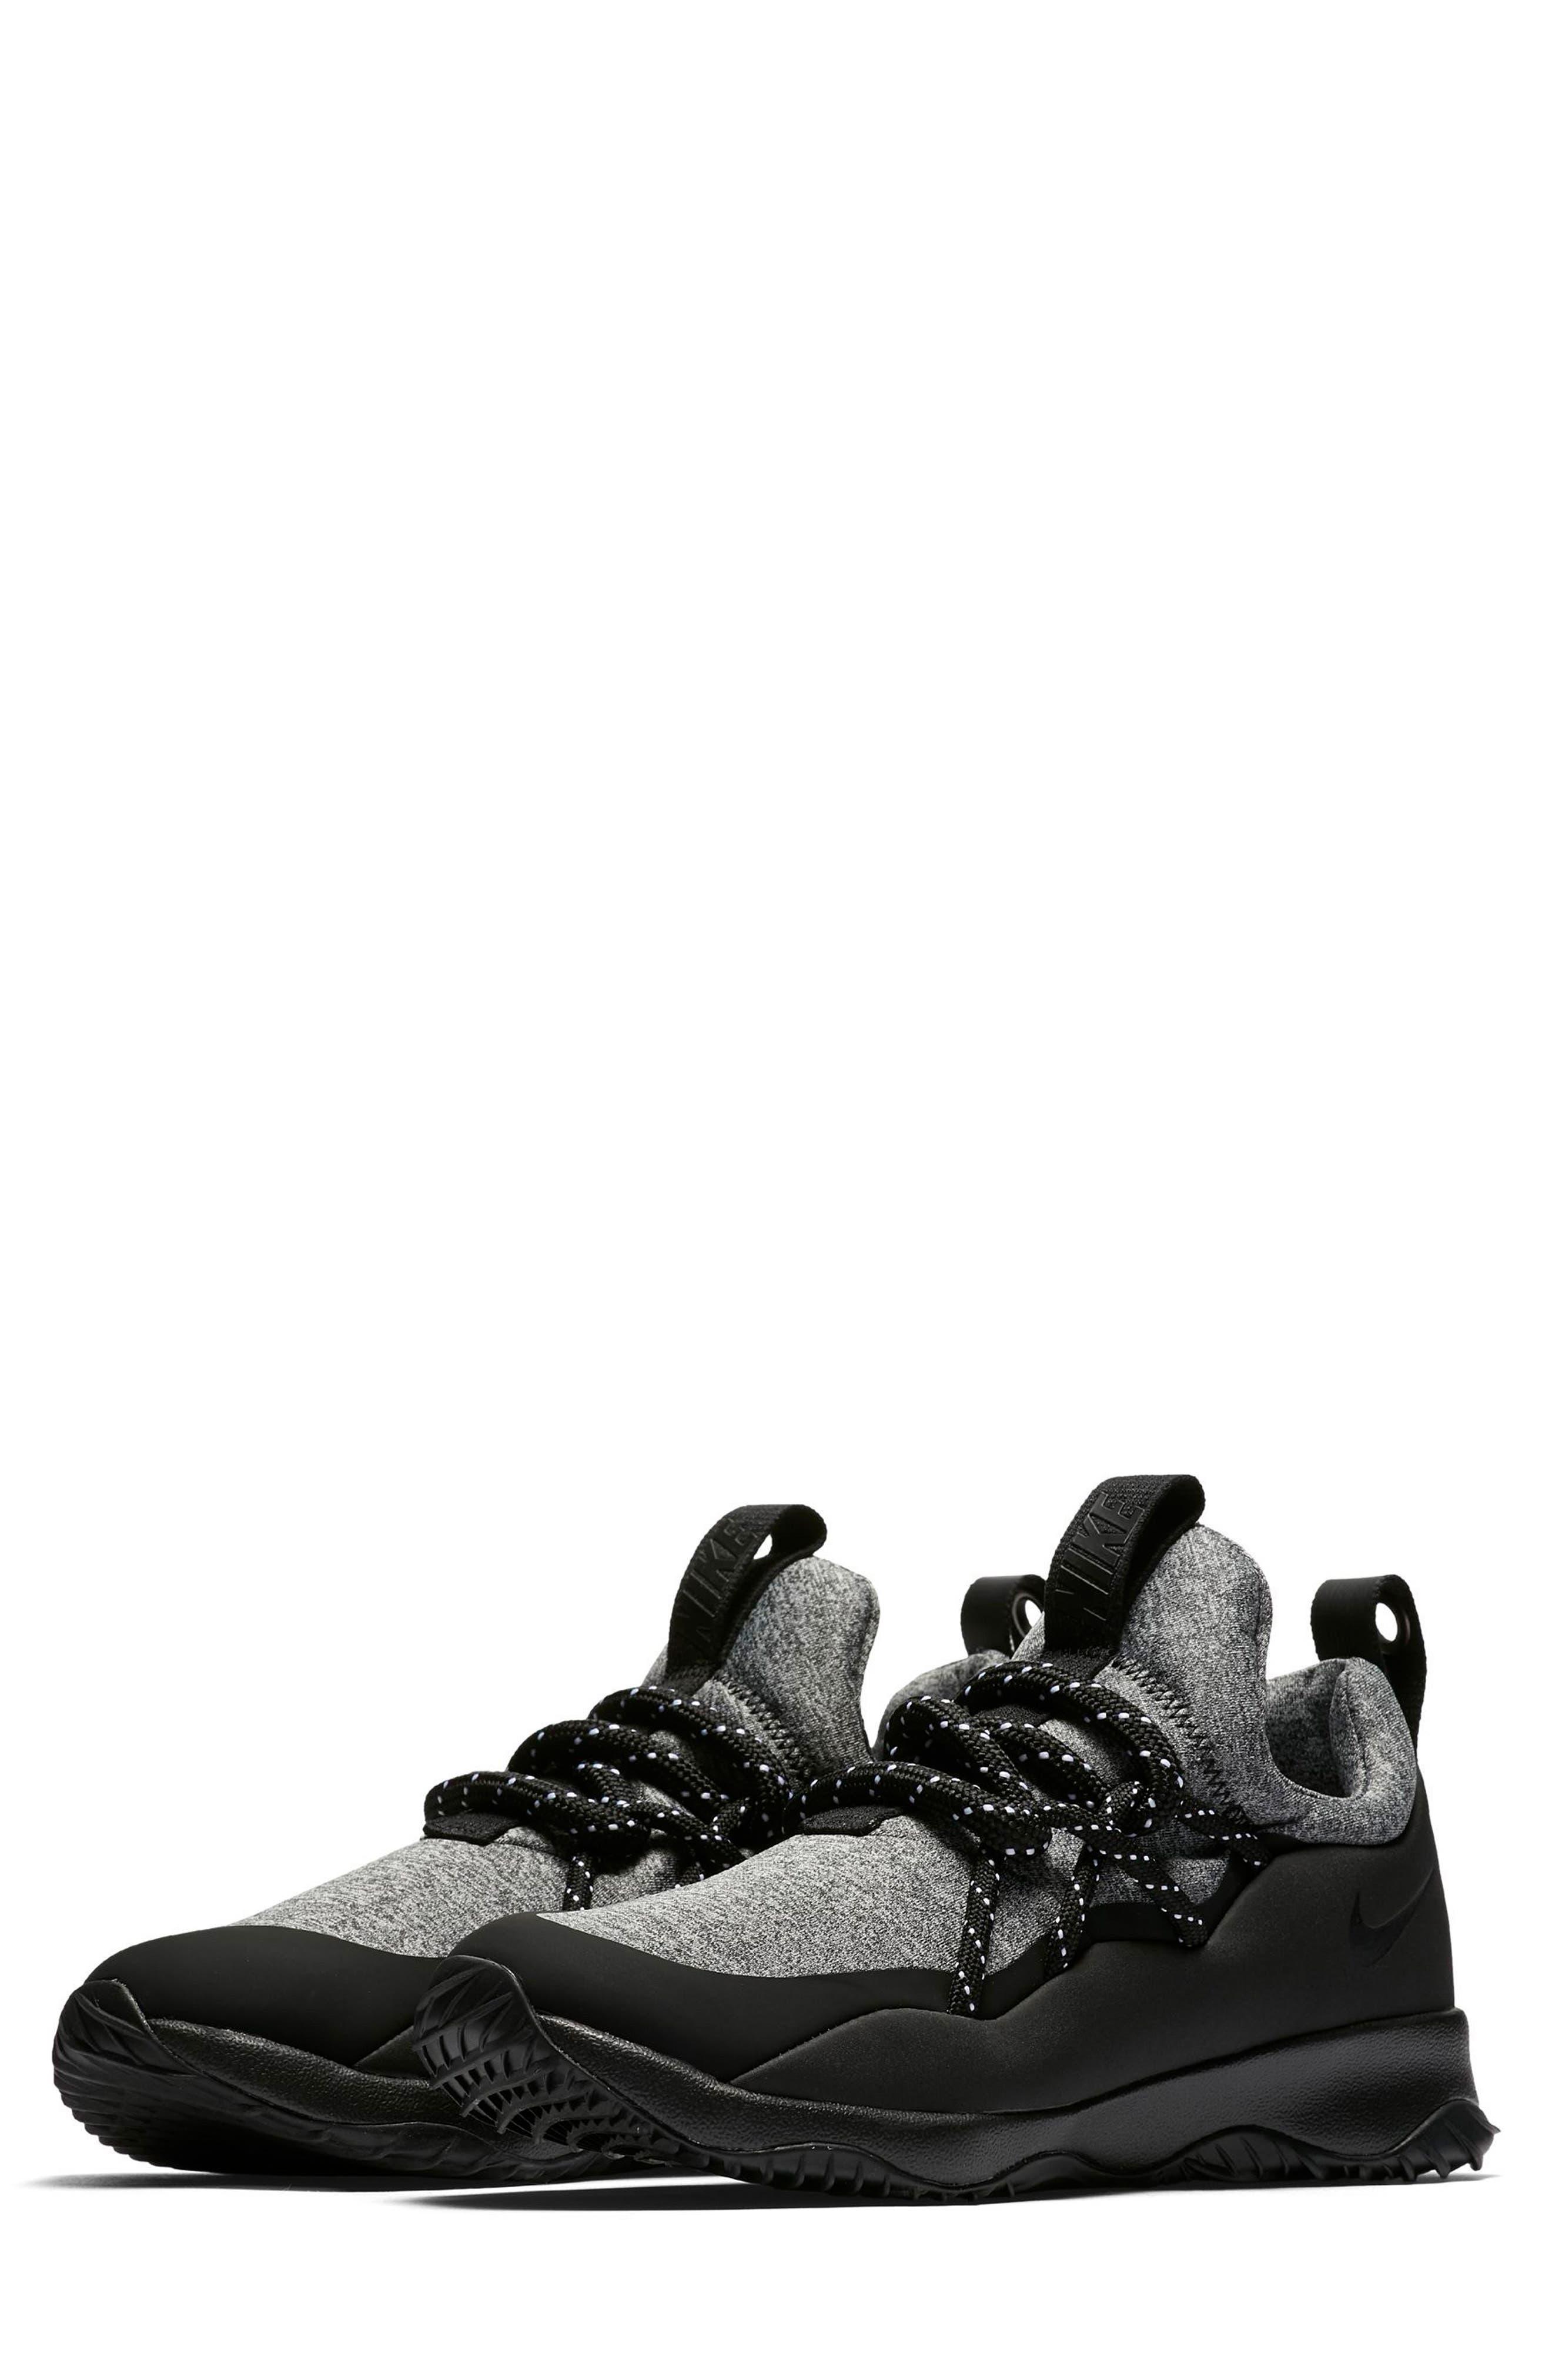 City Loop Sneaker,                             Main thumbnail 1, color,                             Black/ Black/ White